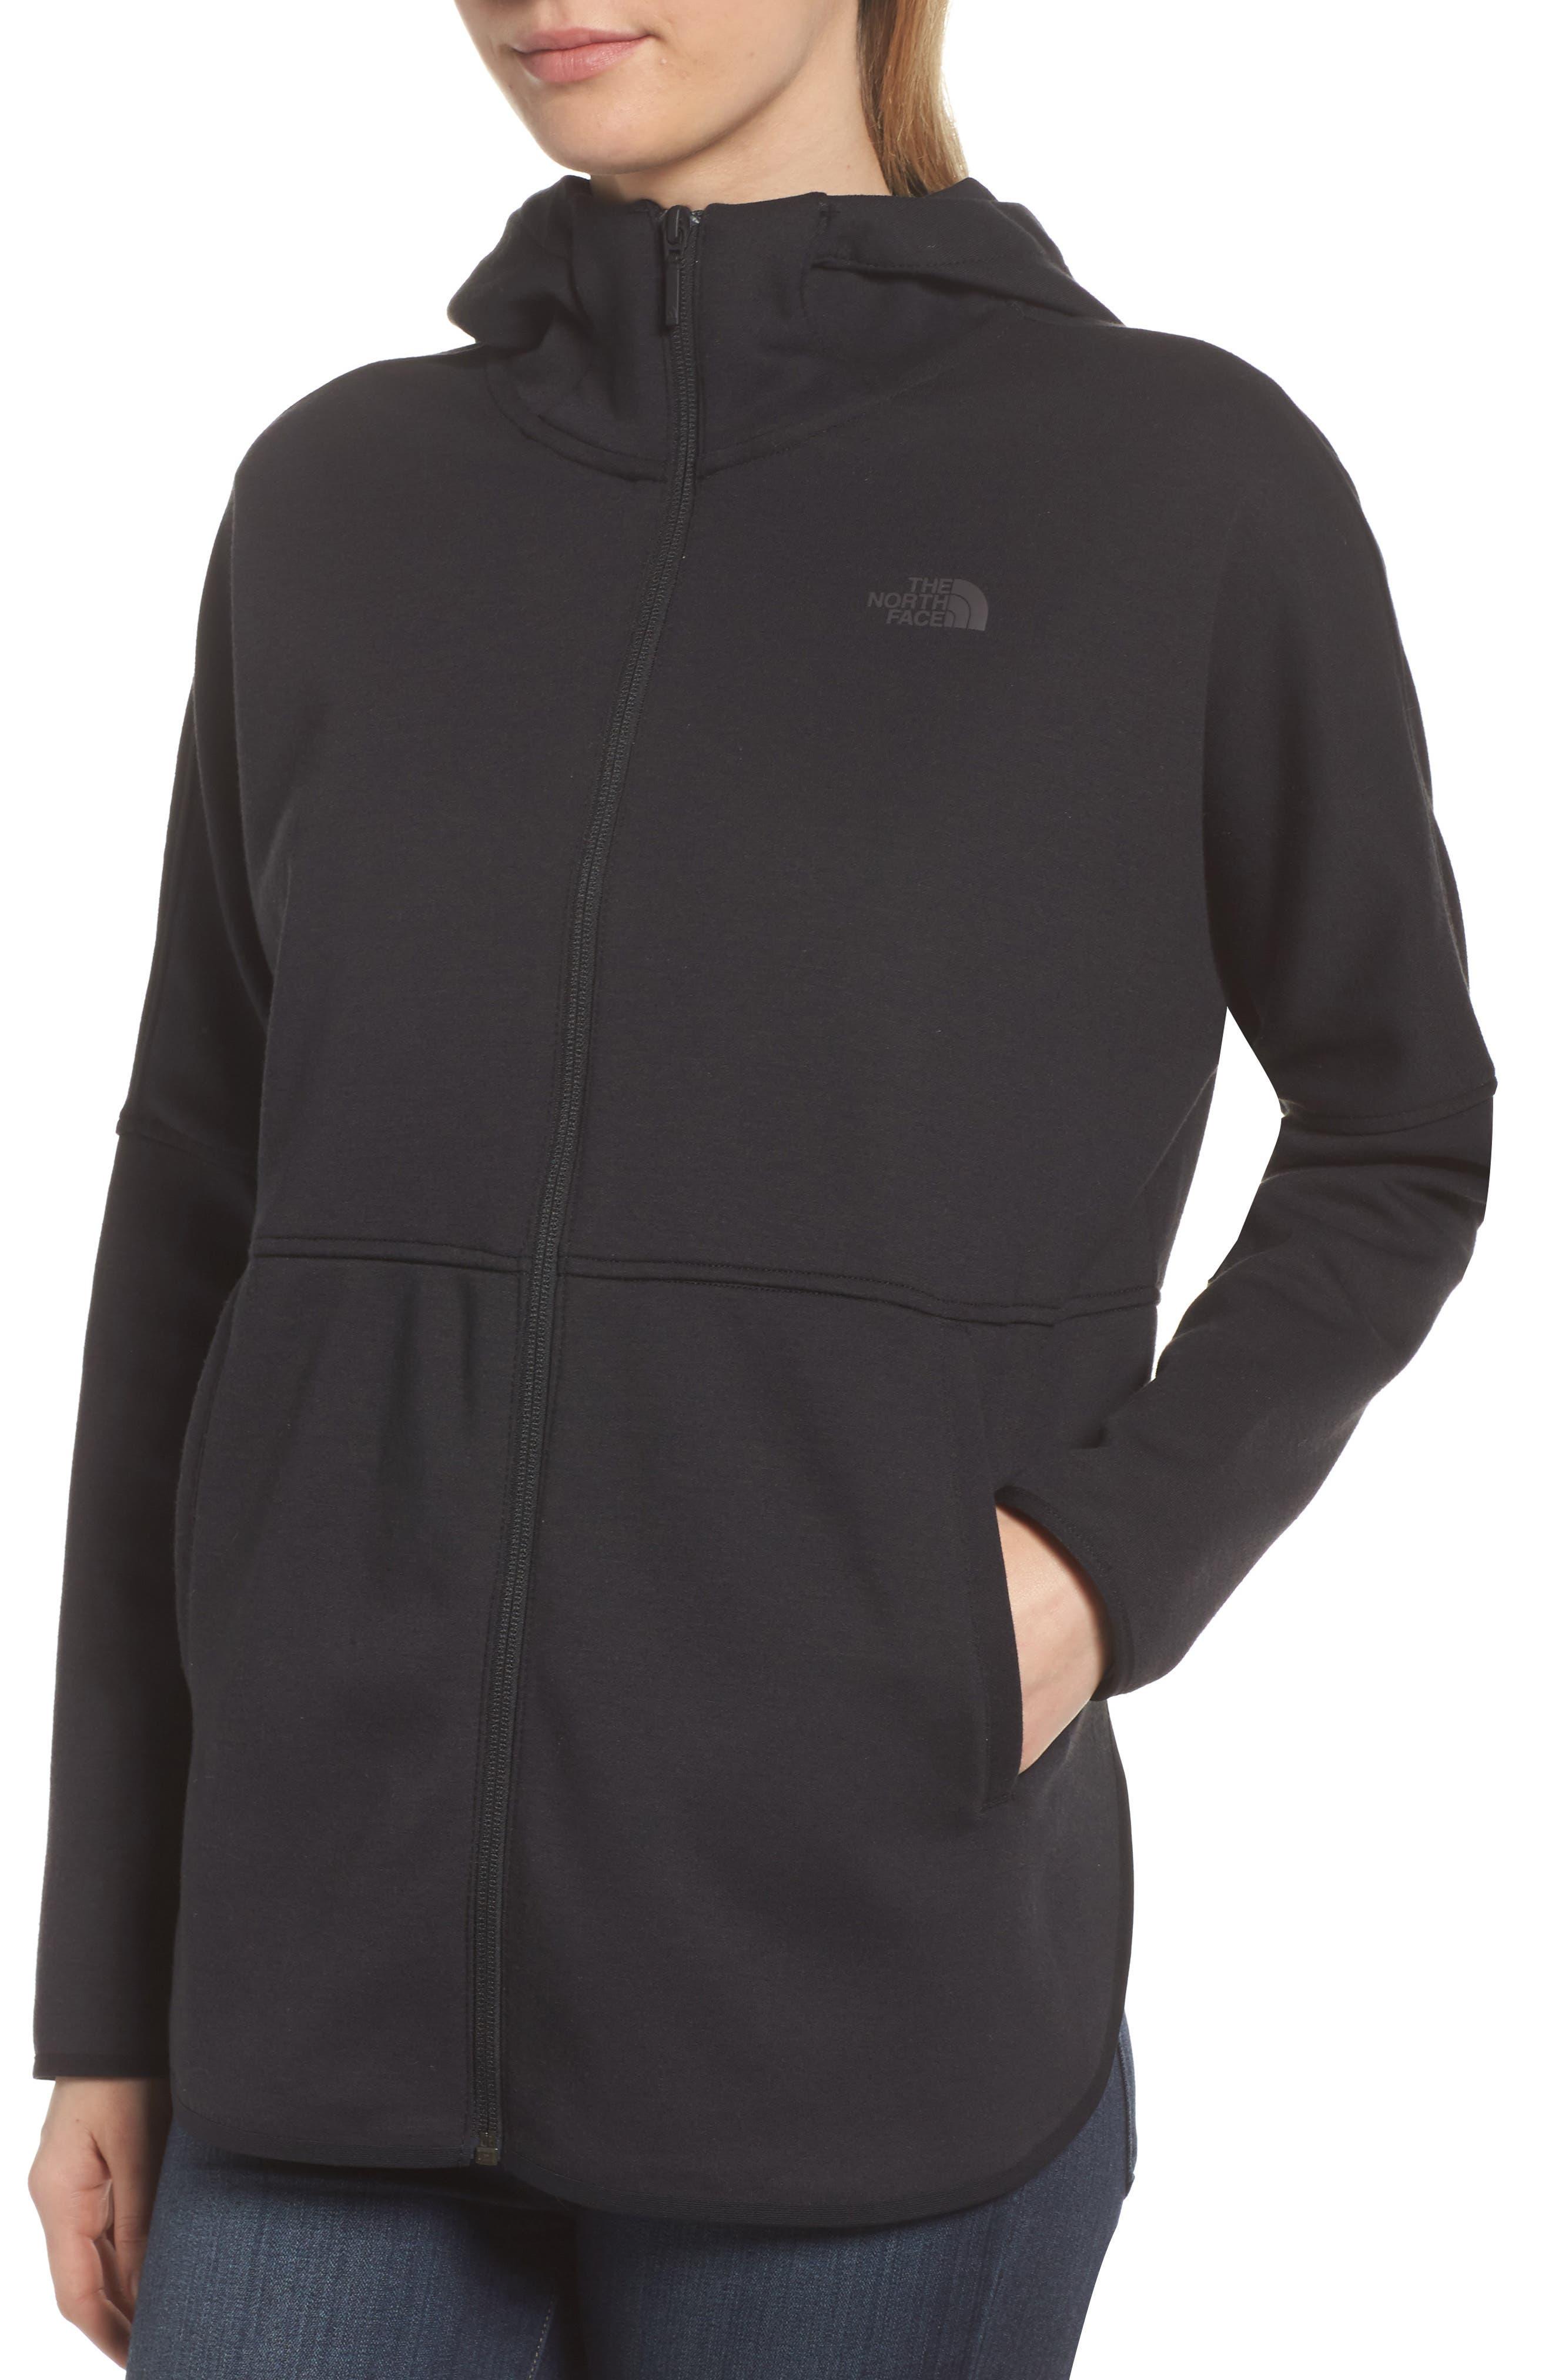 Slacker Hooded Jacket,                             Alternate thumbnail 4, color,                             Tnf Black